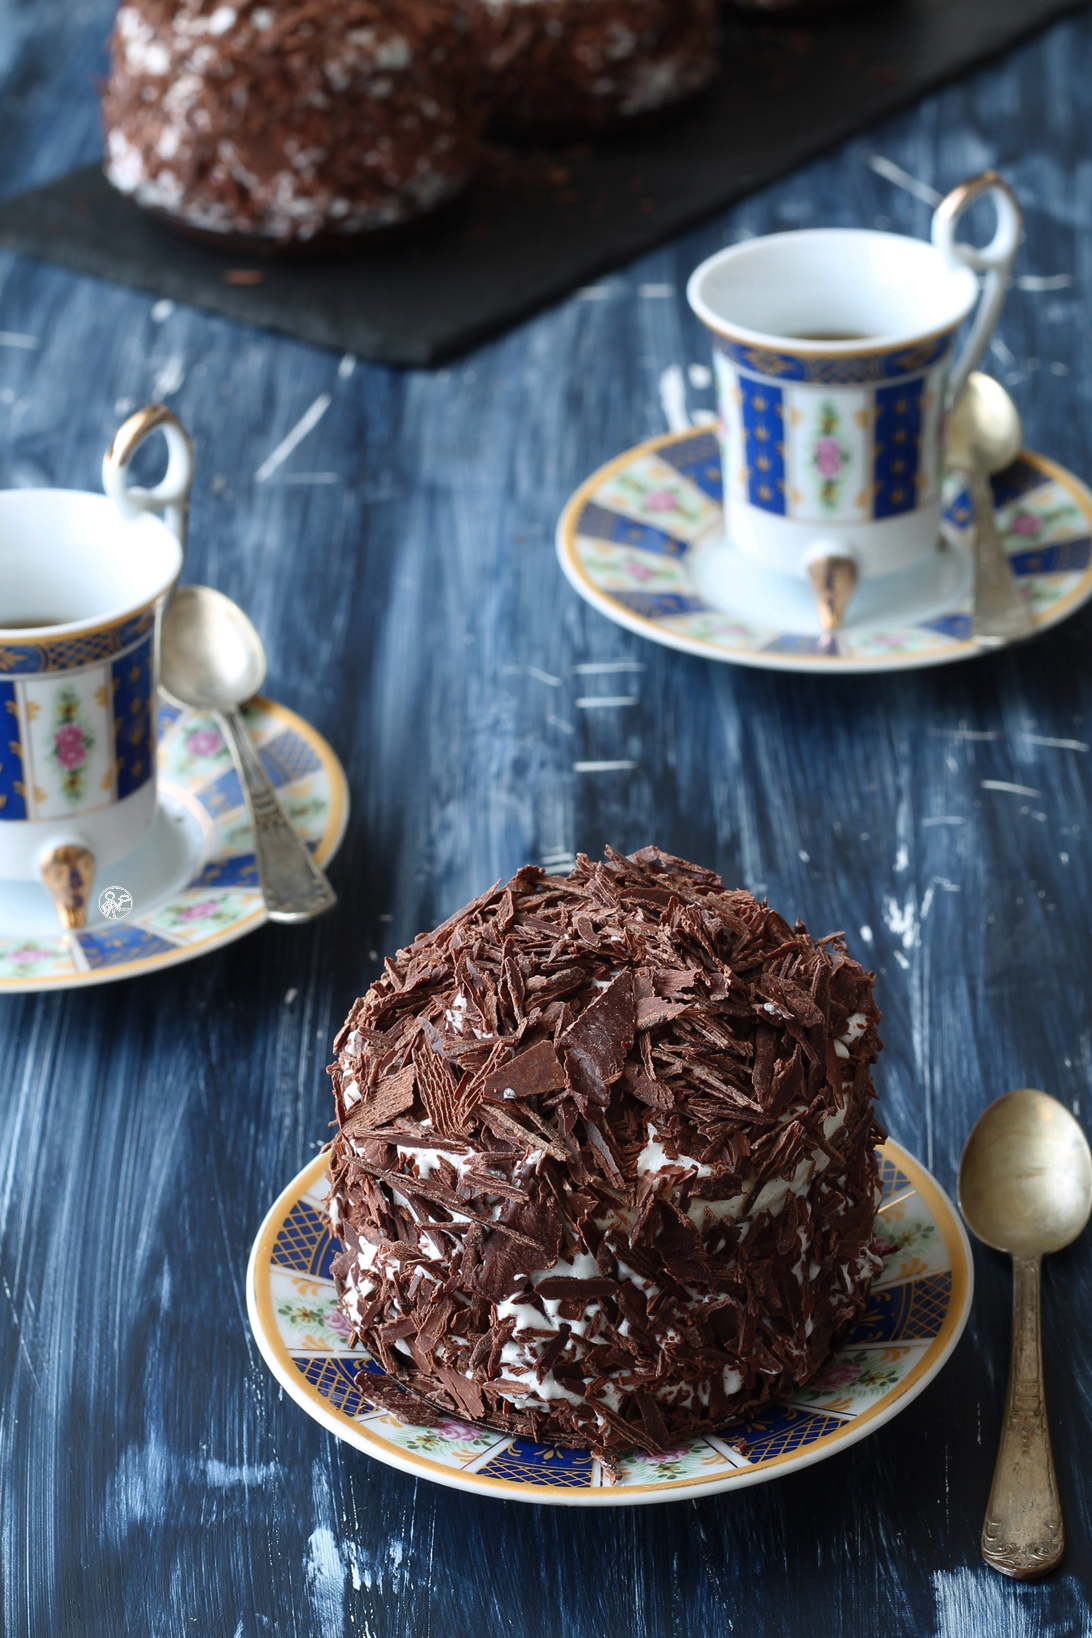 Merveilleux au chocolat sans gluten - La Cassata Celiaca